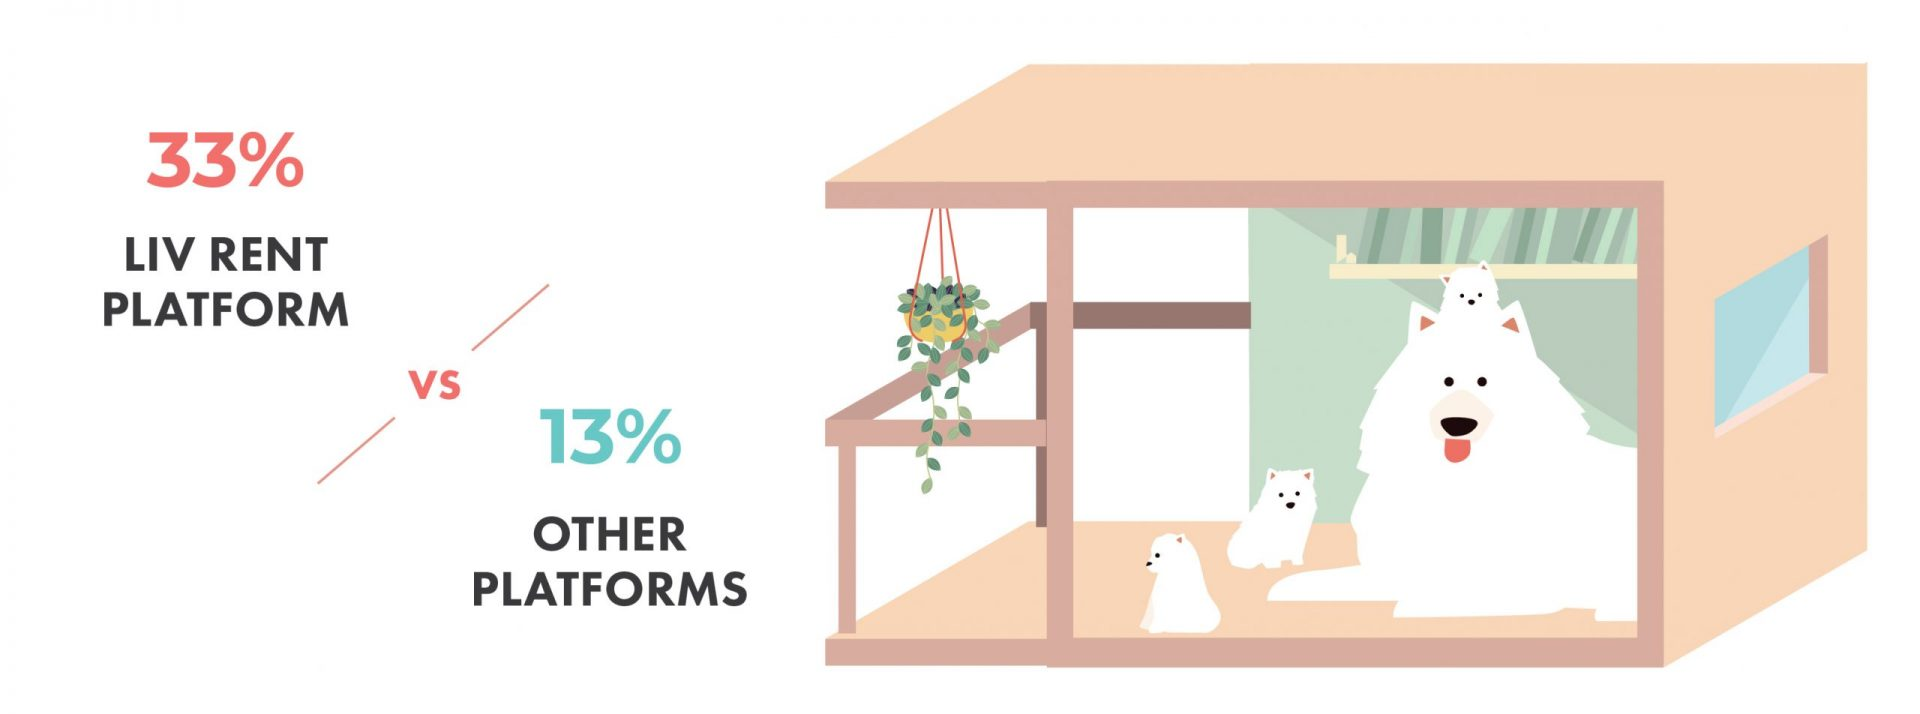 Pet friendly rentals in Vancouver - liv Rent Platform vs. Other Platforms